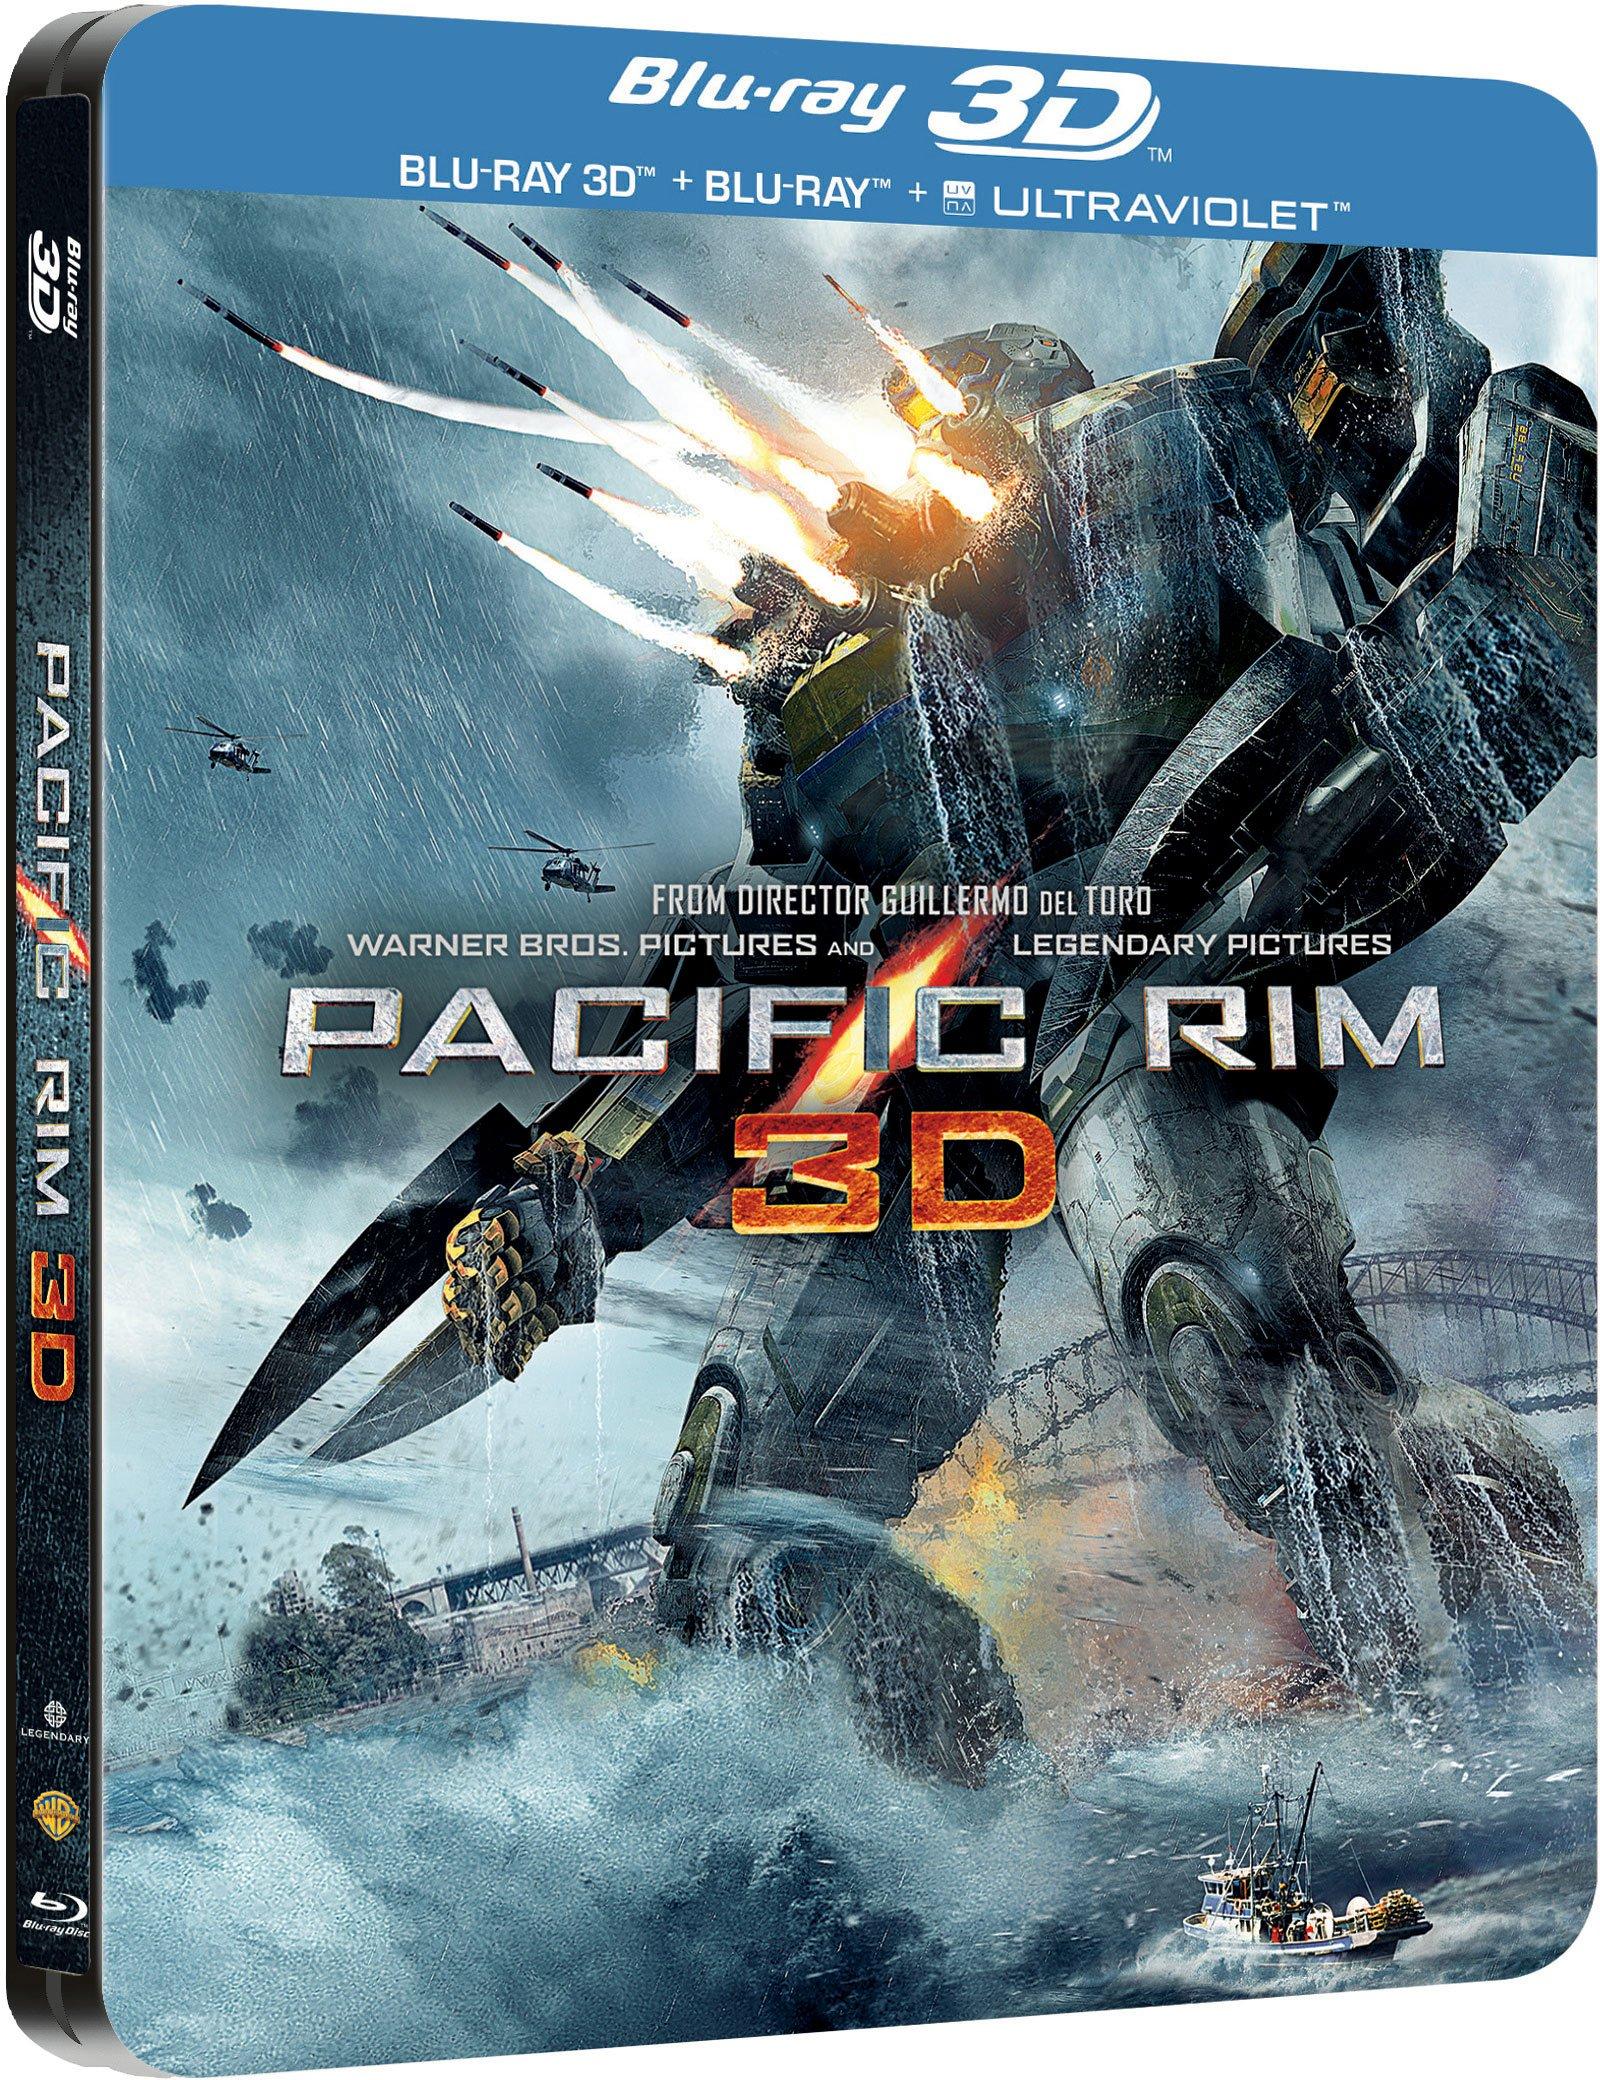 环太平洋/悍战太平洋(港) Pacific Rim 2013 Blu-ray 1080p AVC DTS-HD MA ... Pacific Rim 2013 Bluray